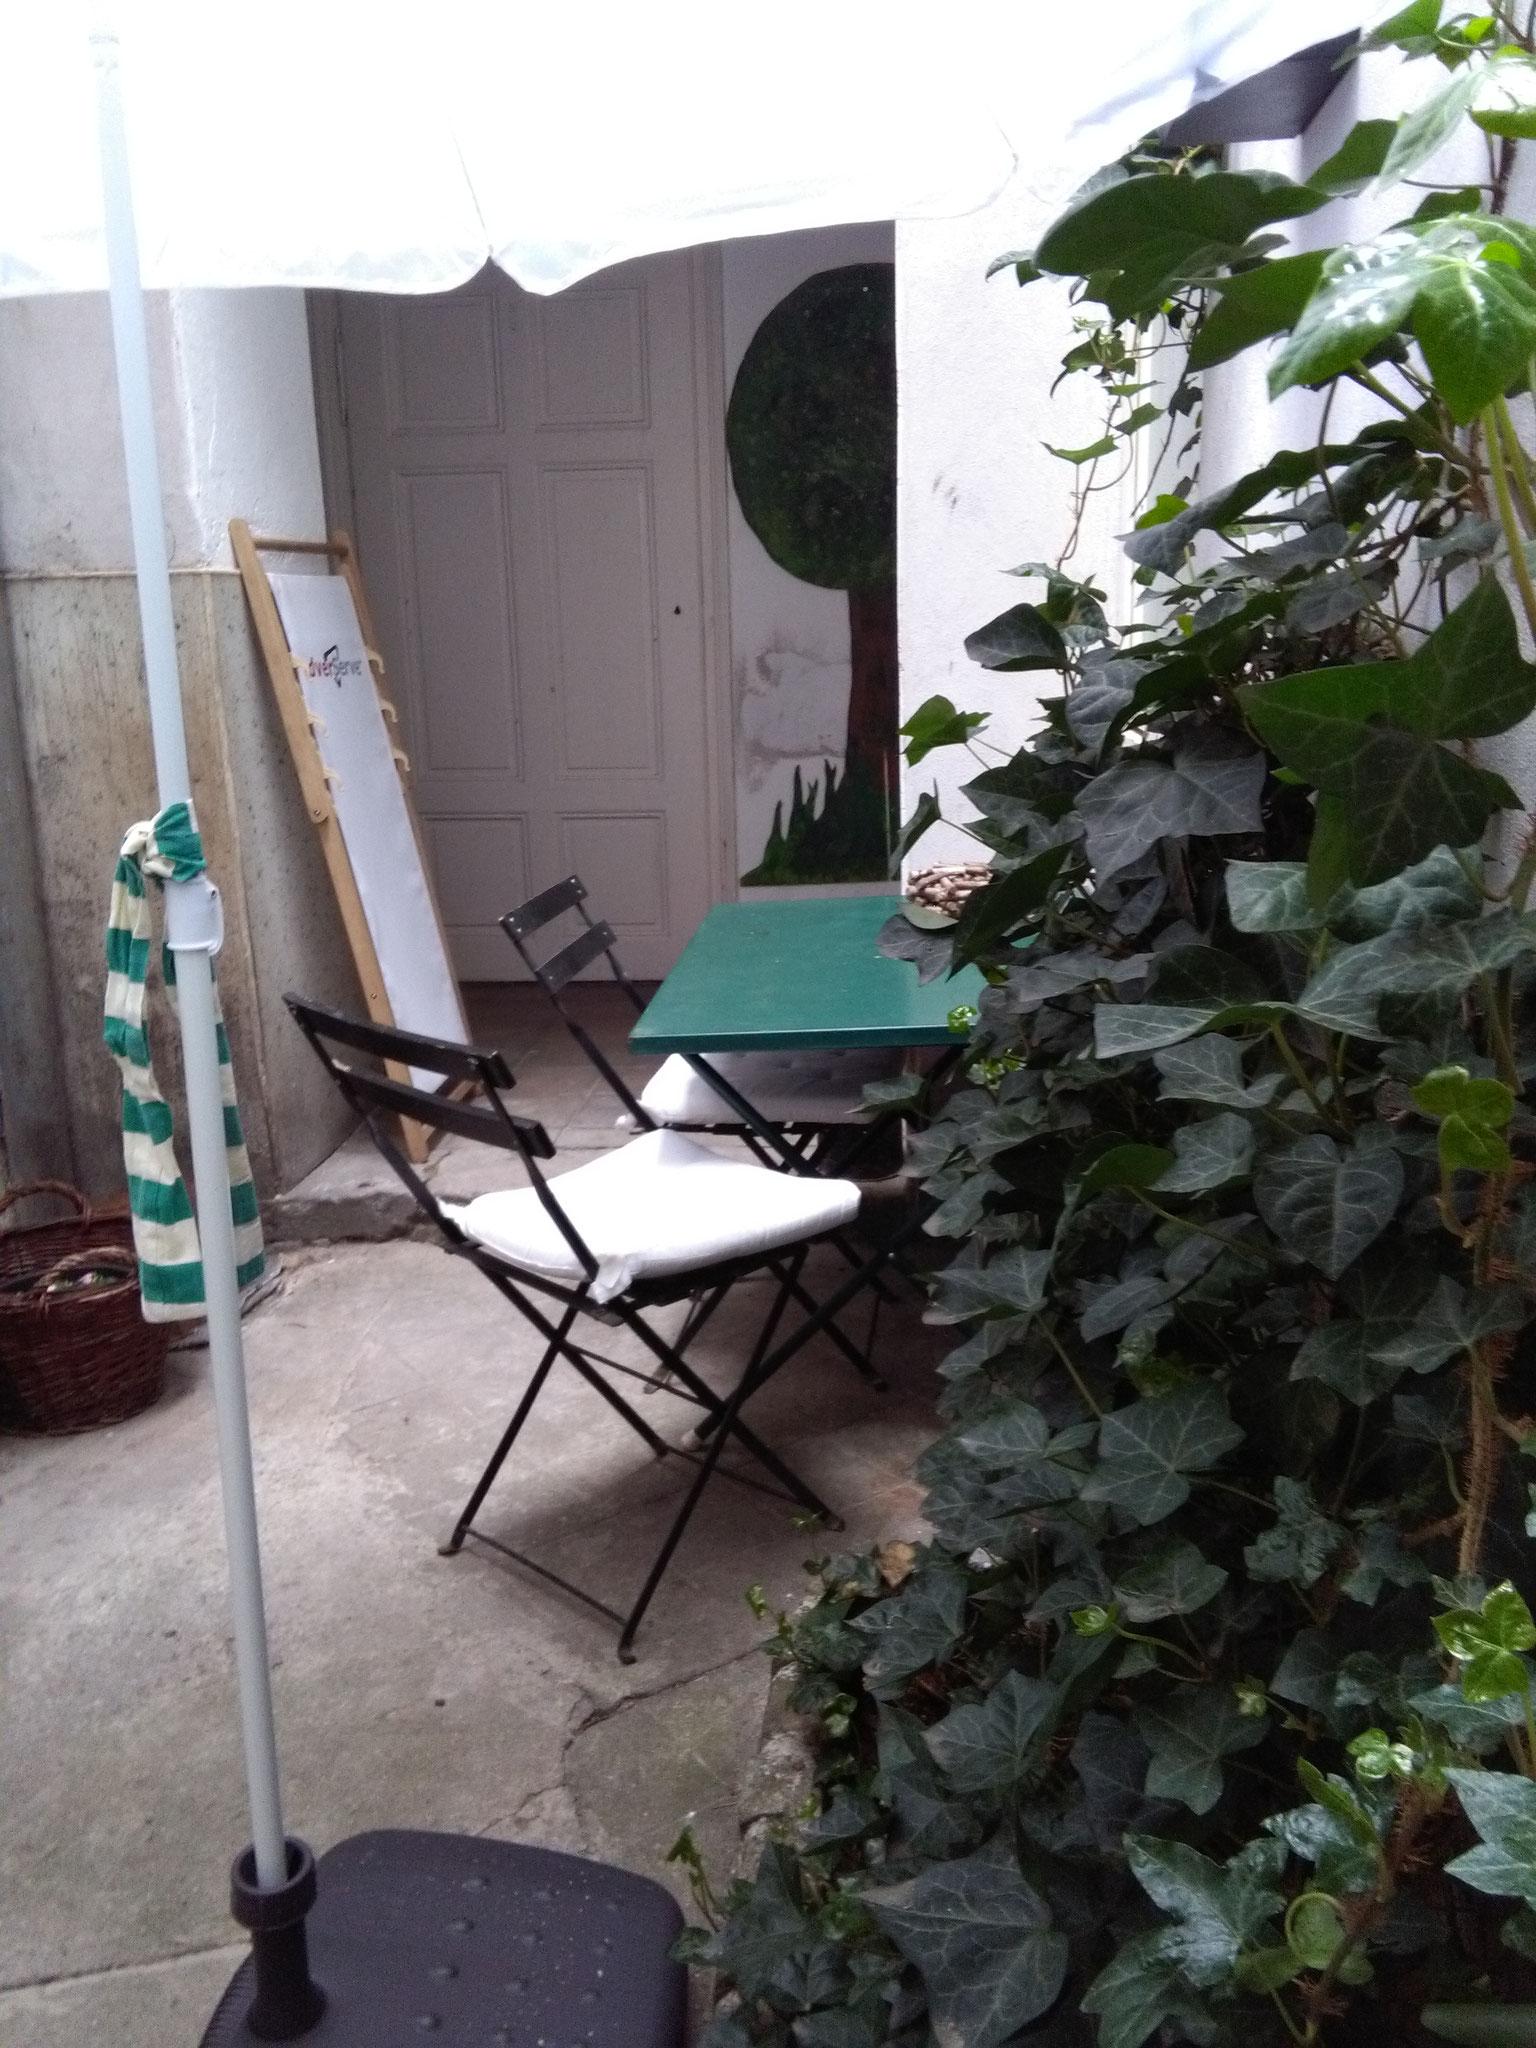 Stille im Innenhof